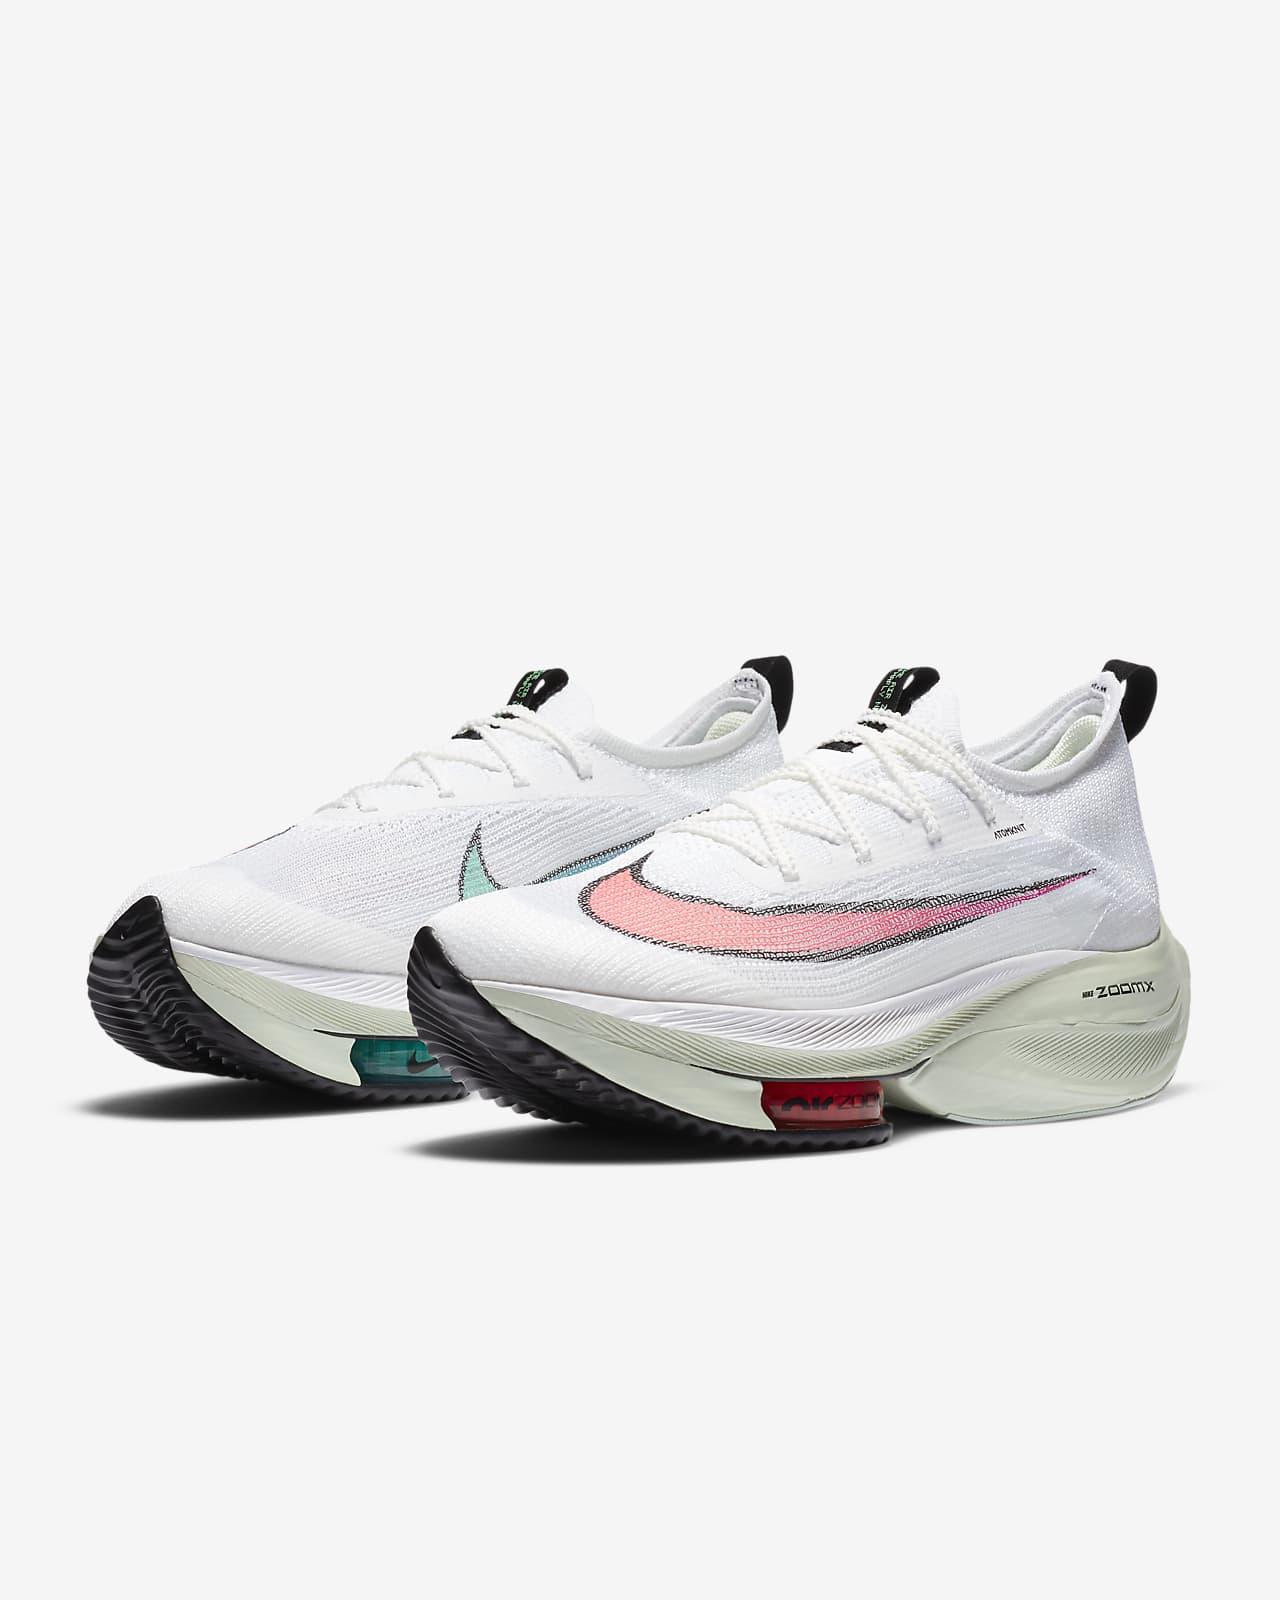 Nike Air Zoom Alphafly NEXT% Men's